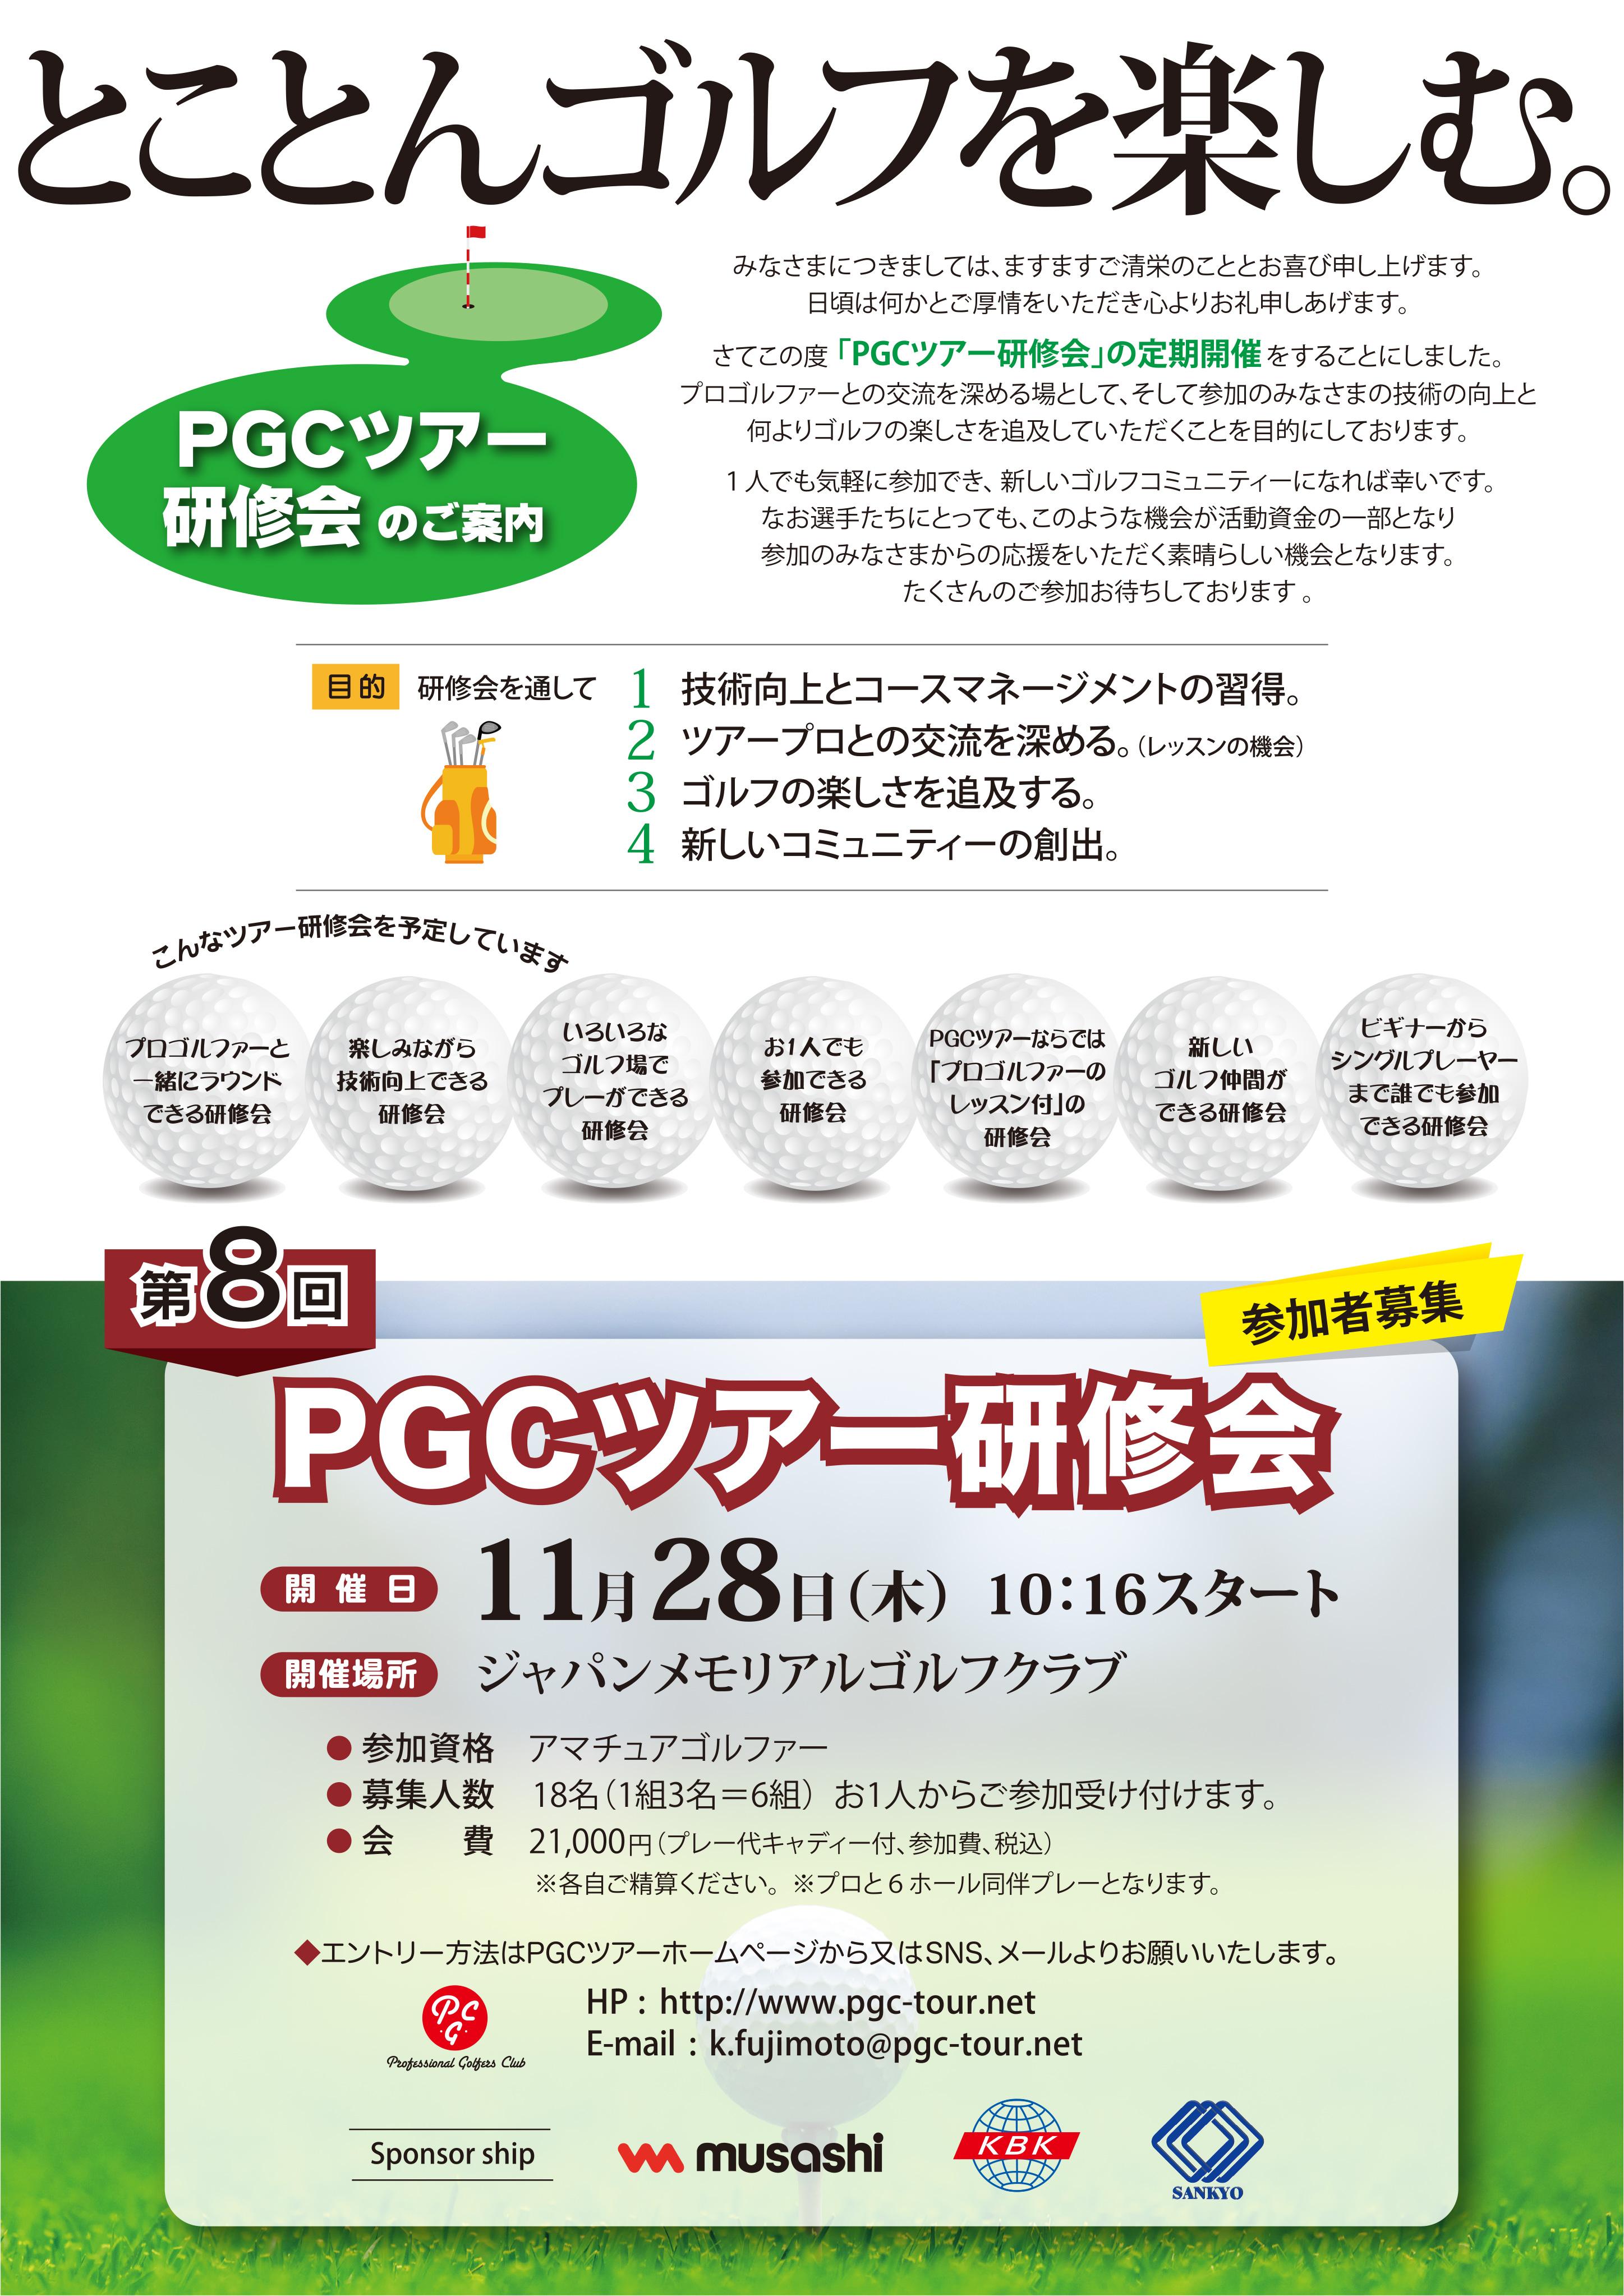 『PGCツアー研修会』第8回.jpg